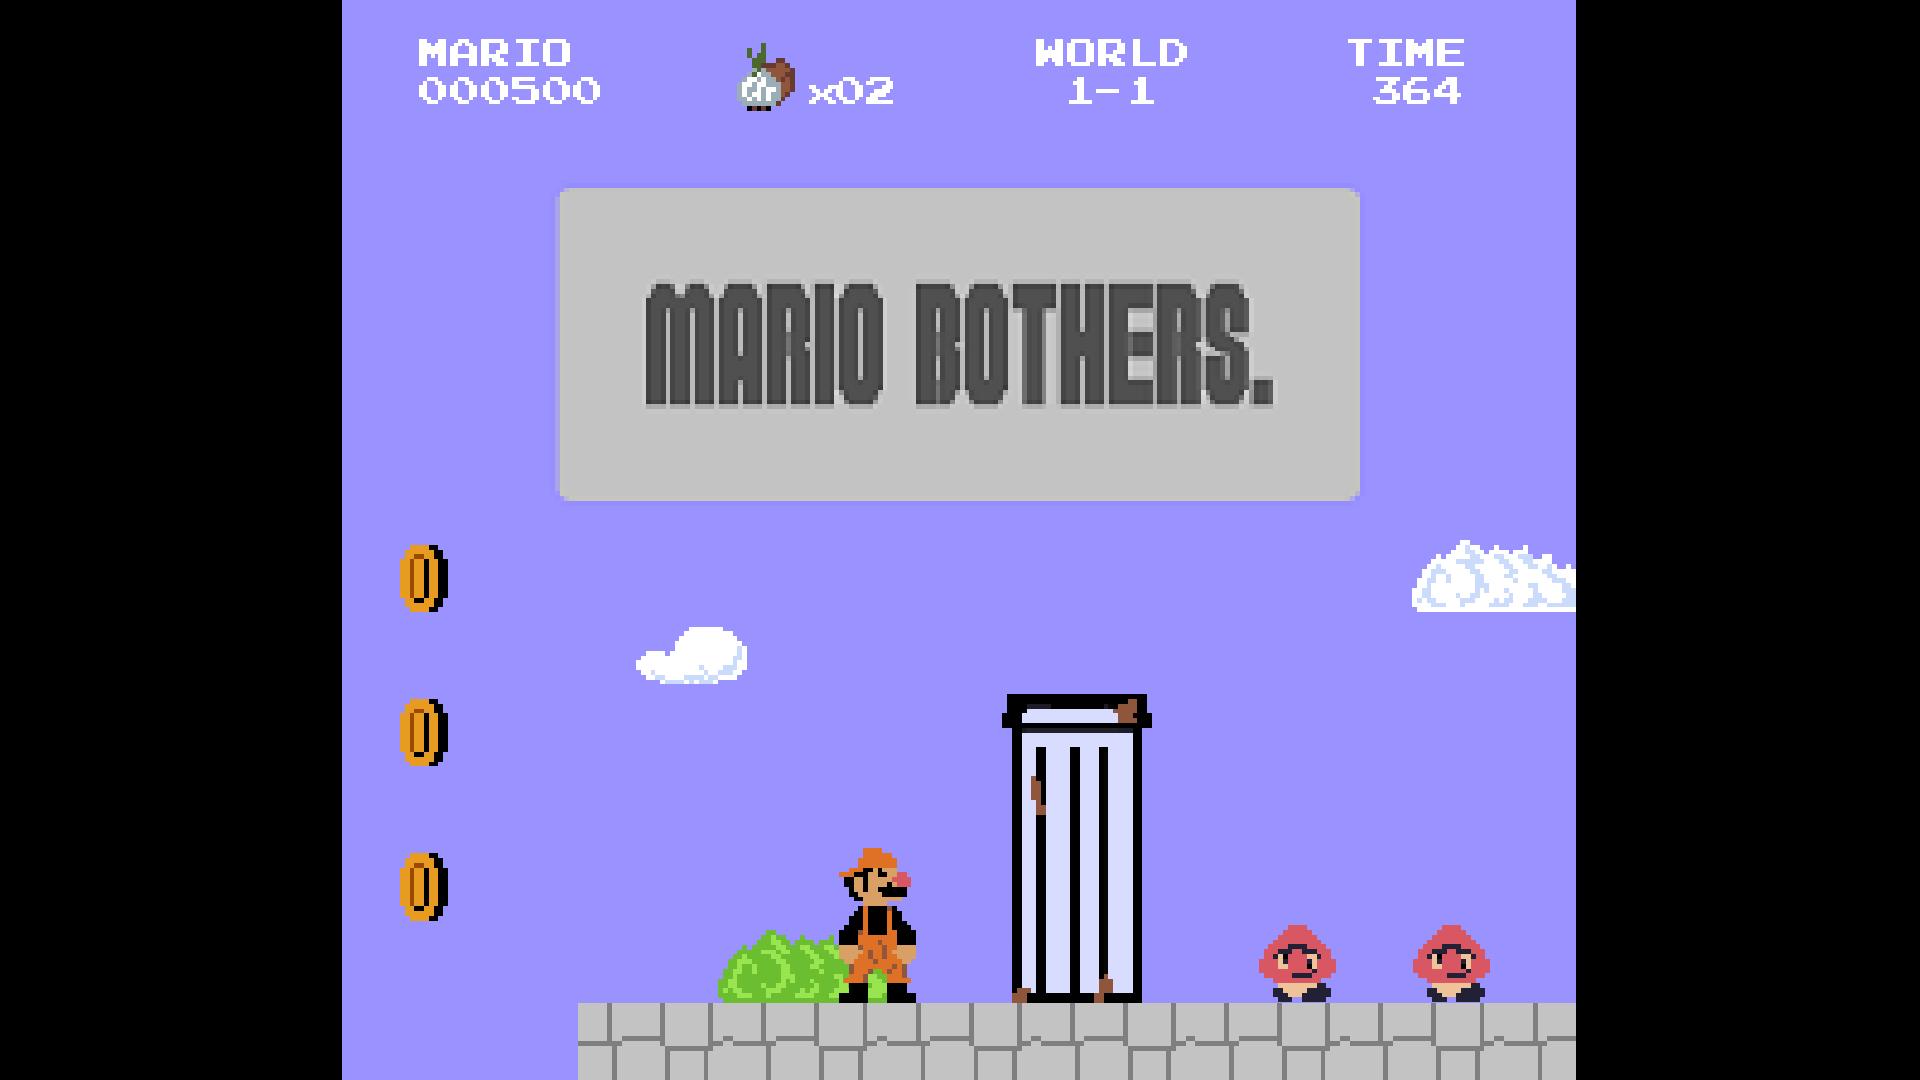 Super Mario Bothers